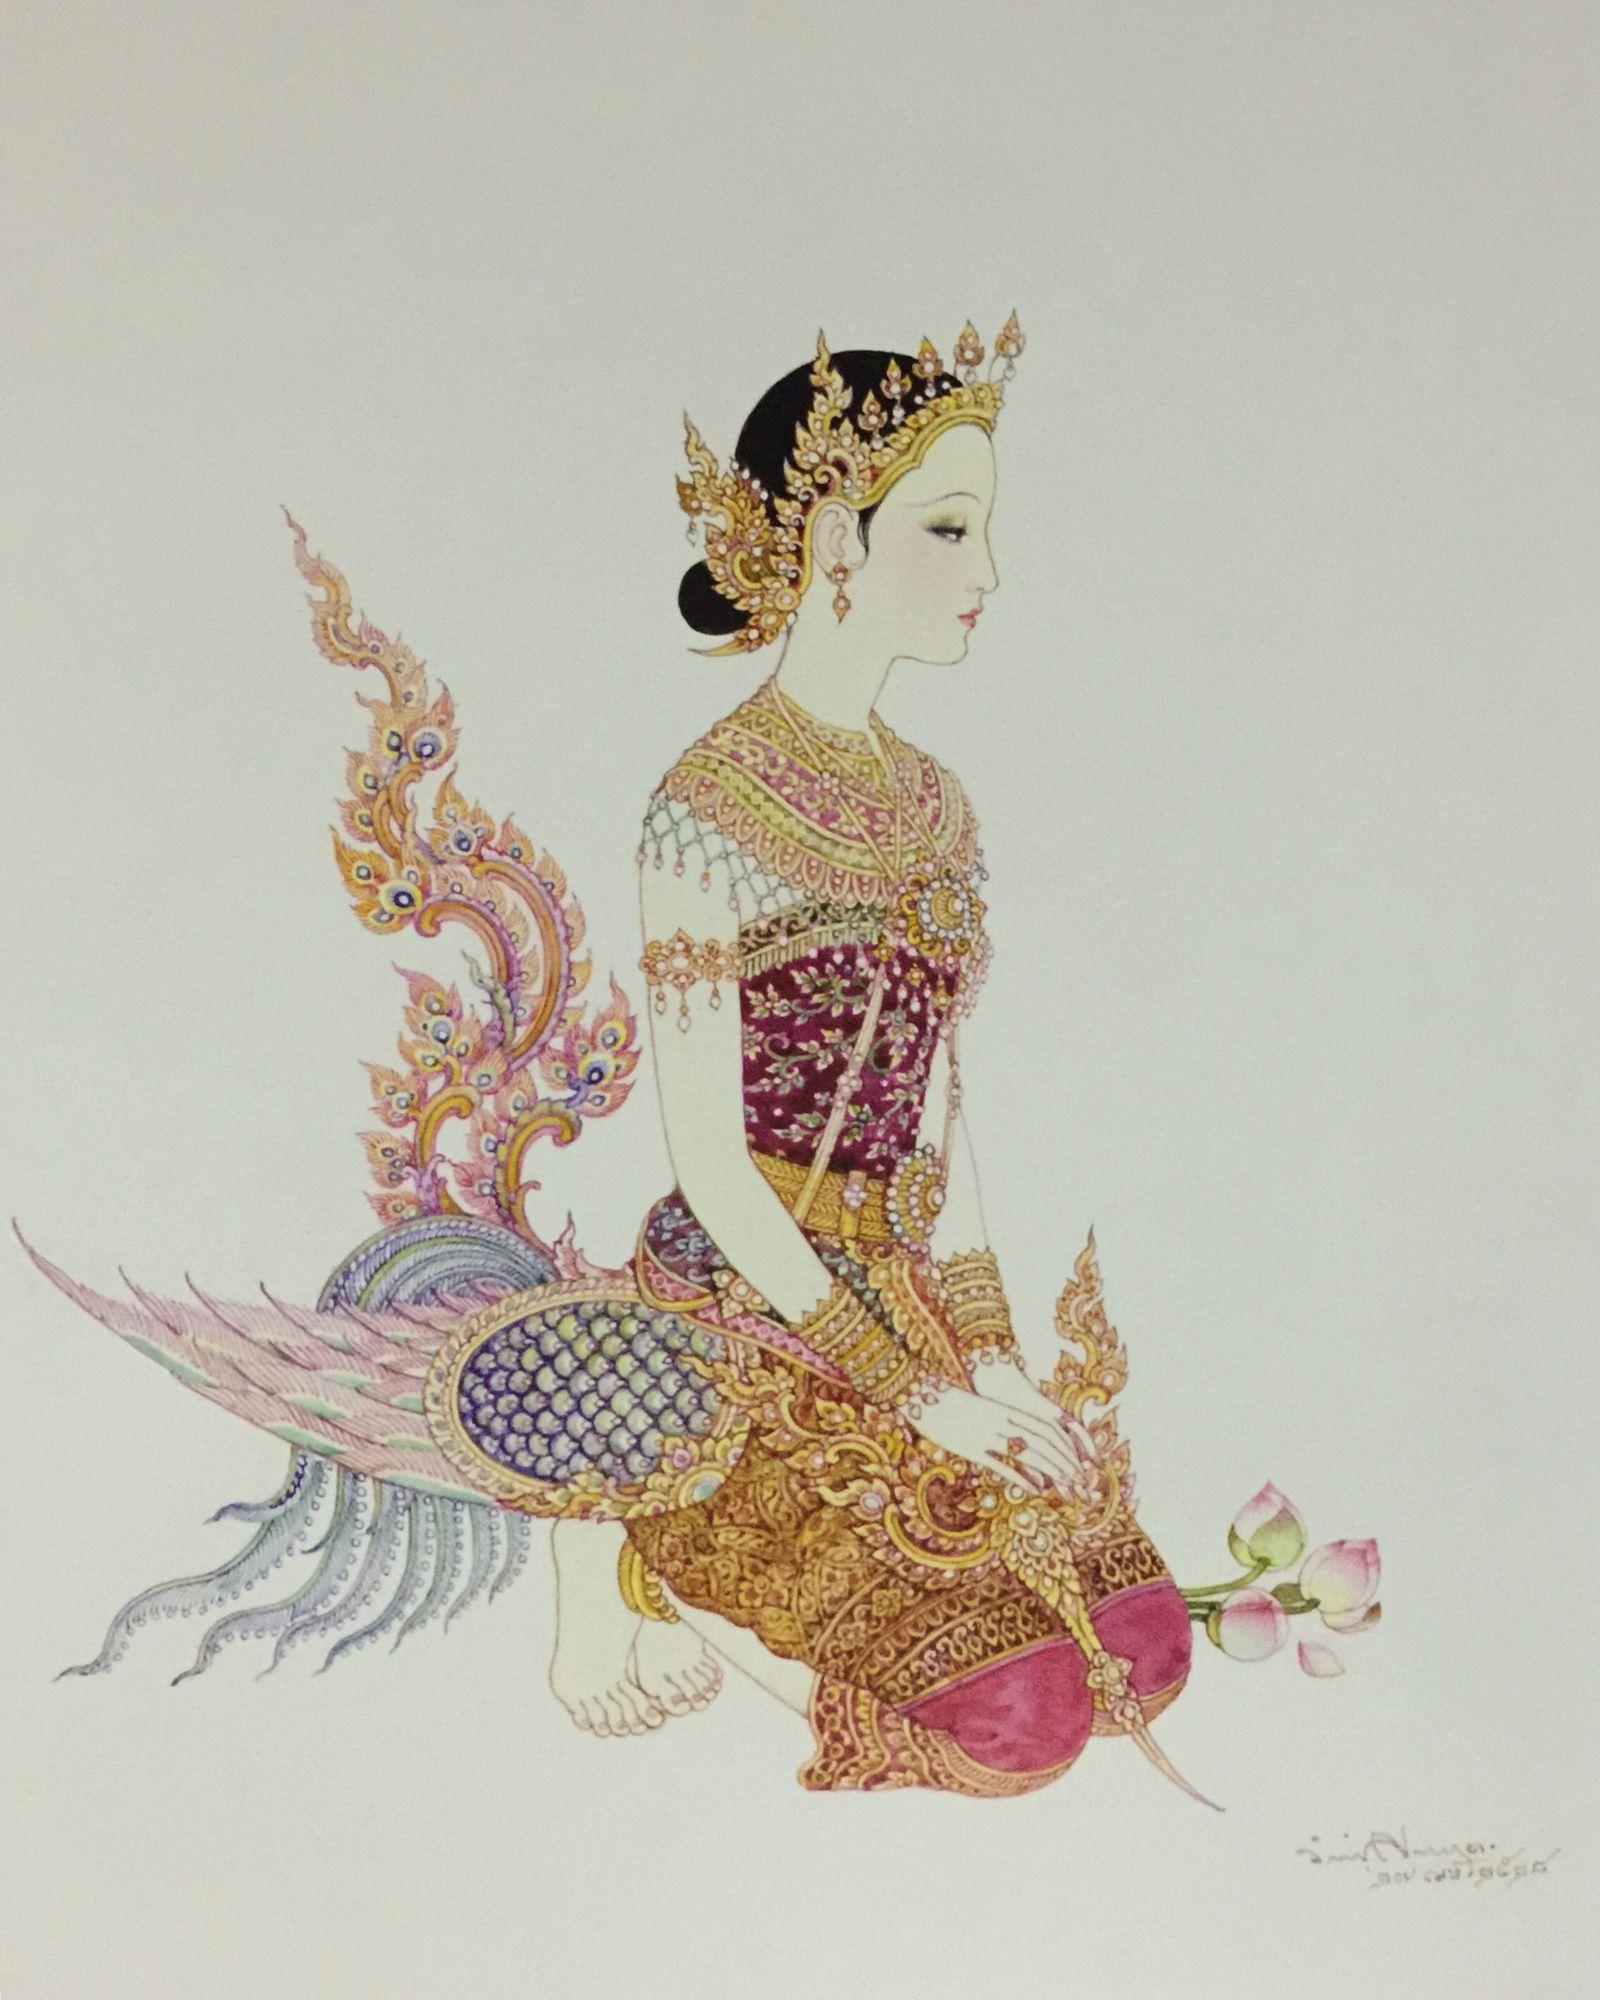 a kinnari in a tiara 1985 watercolor on paper by a thai national artist chakrabhand posayakrit ศ ลปะเคลต ก ภาพวาด ศ ลปะไทย